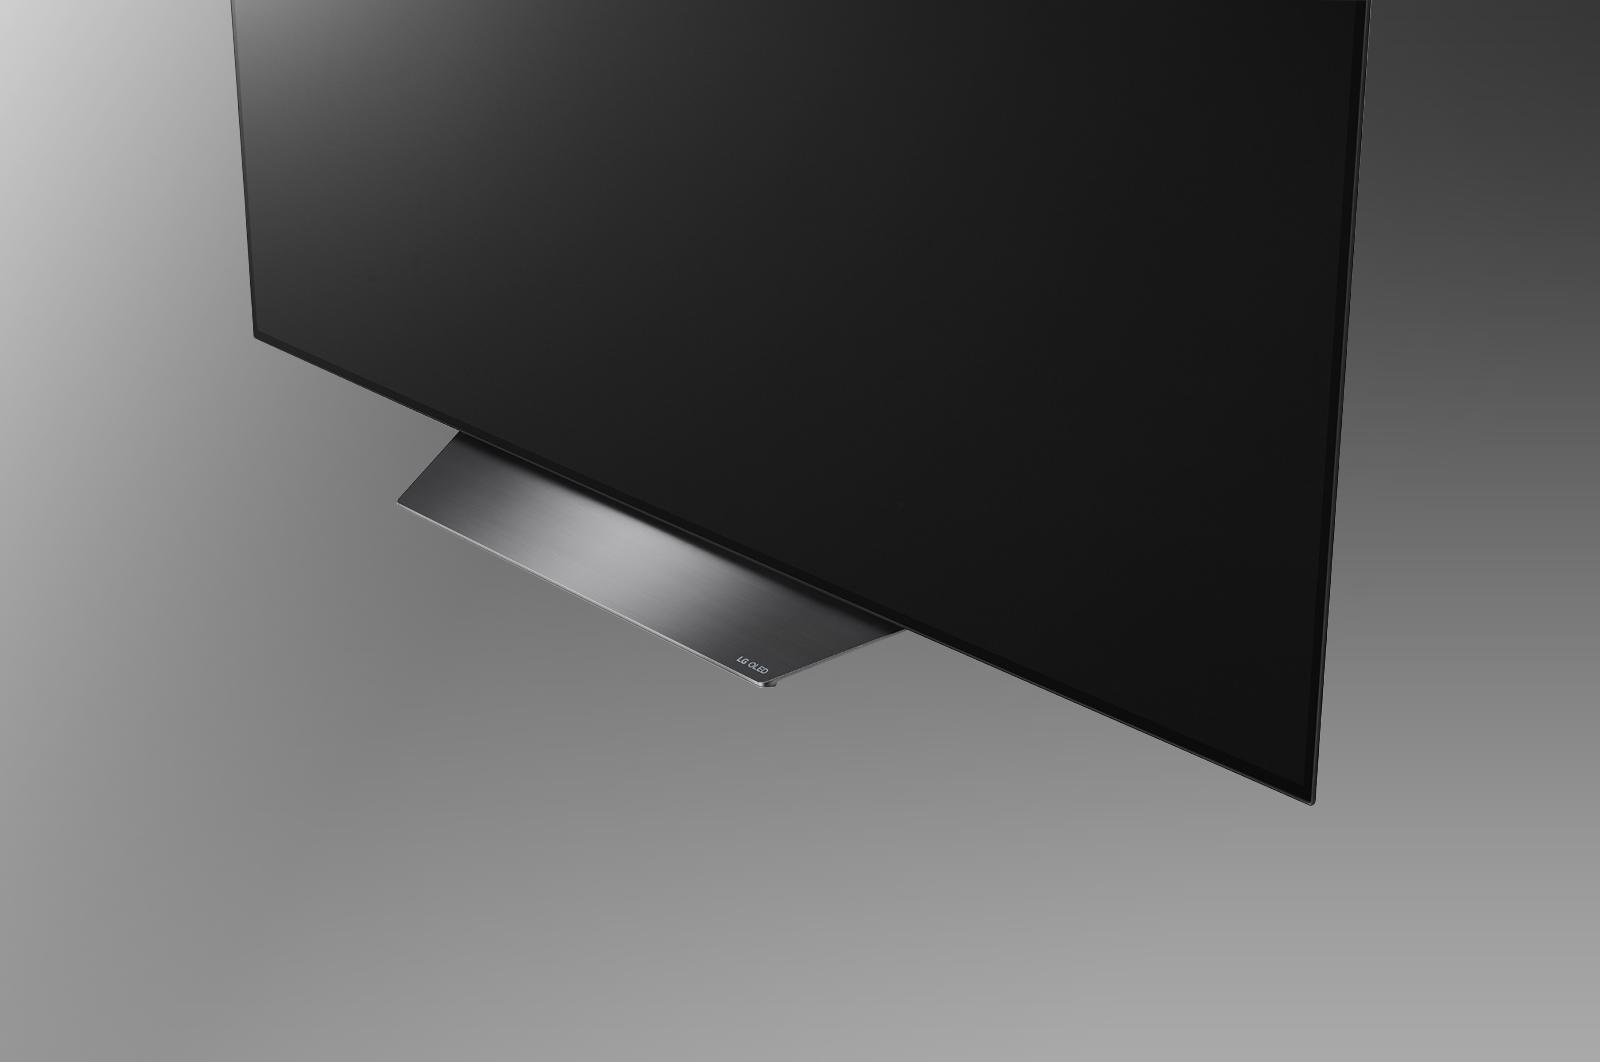 LG 55-inch OLED TV B8   The Nexus